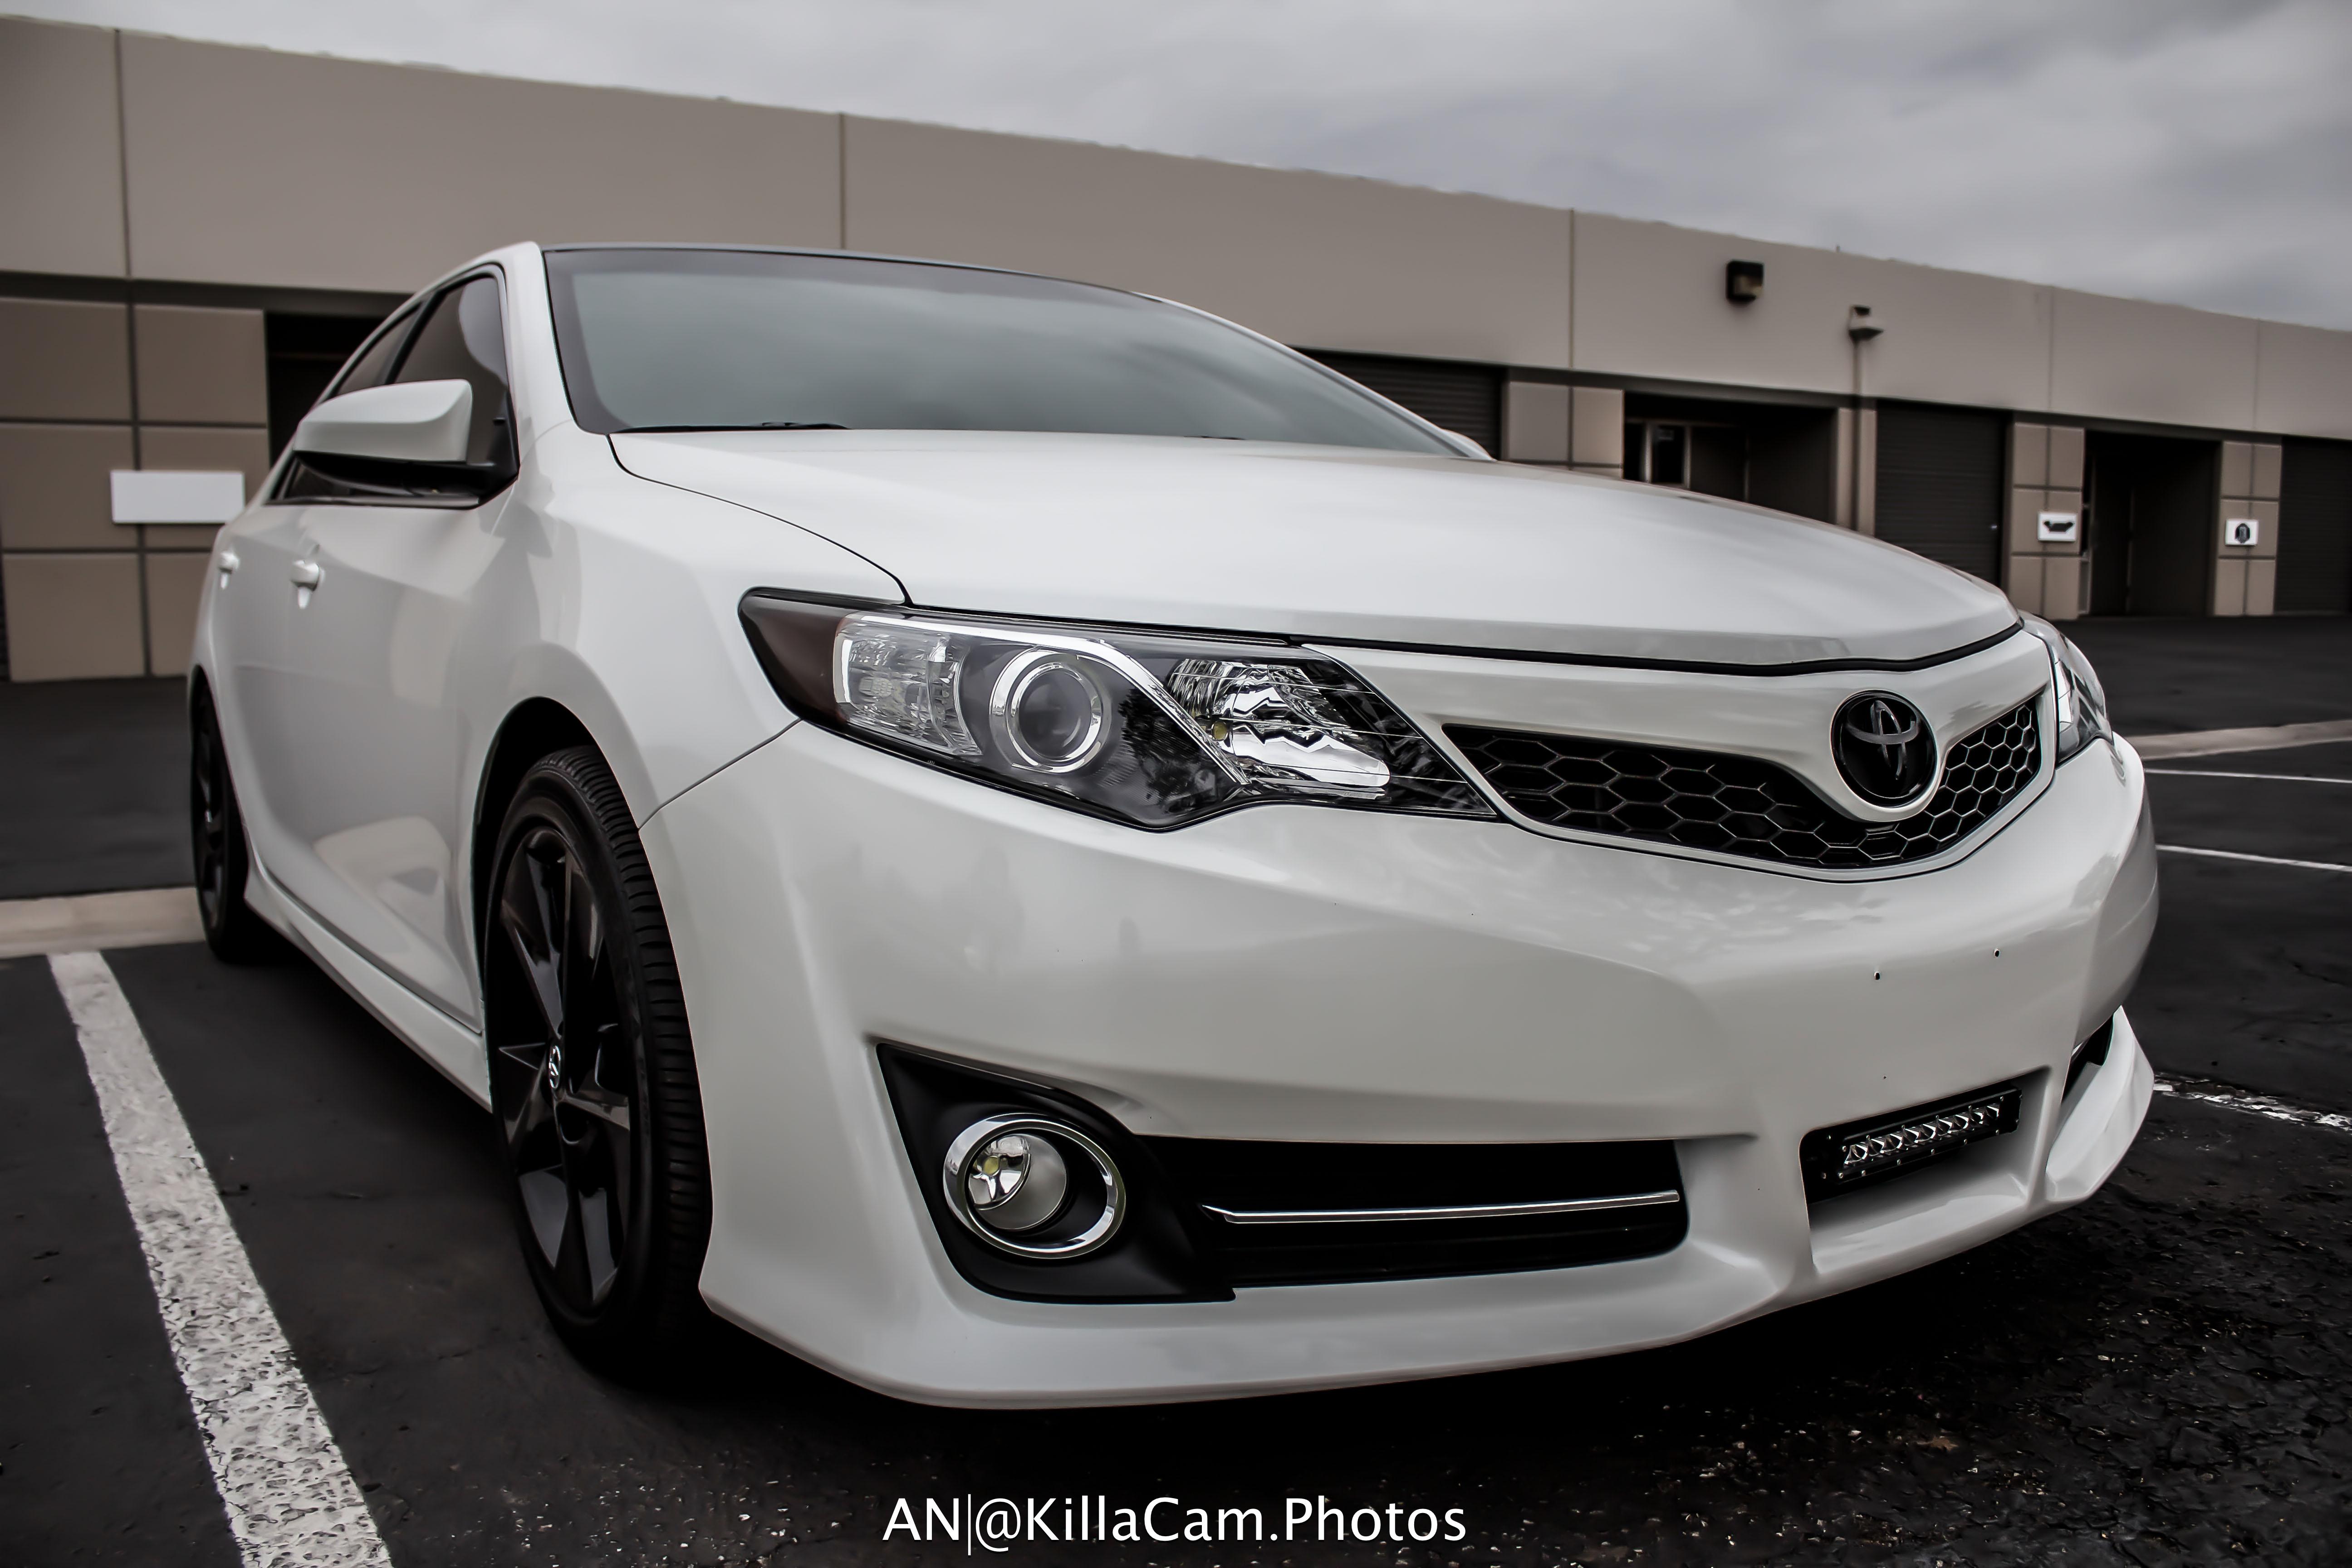 Toyota Camry Vinyl Overlays 2012 2014 Premium Auto Styling